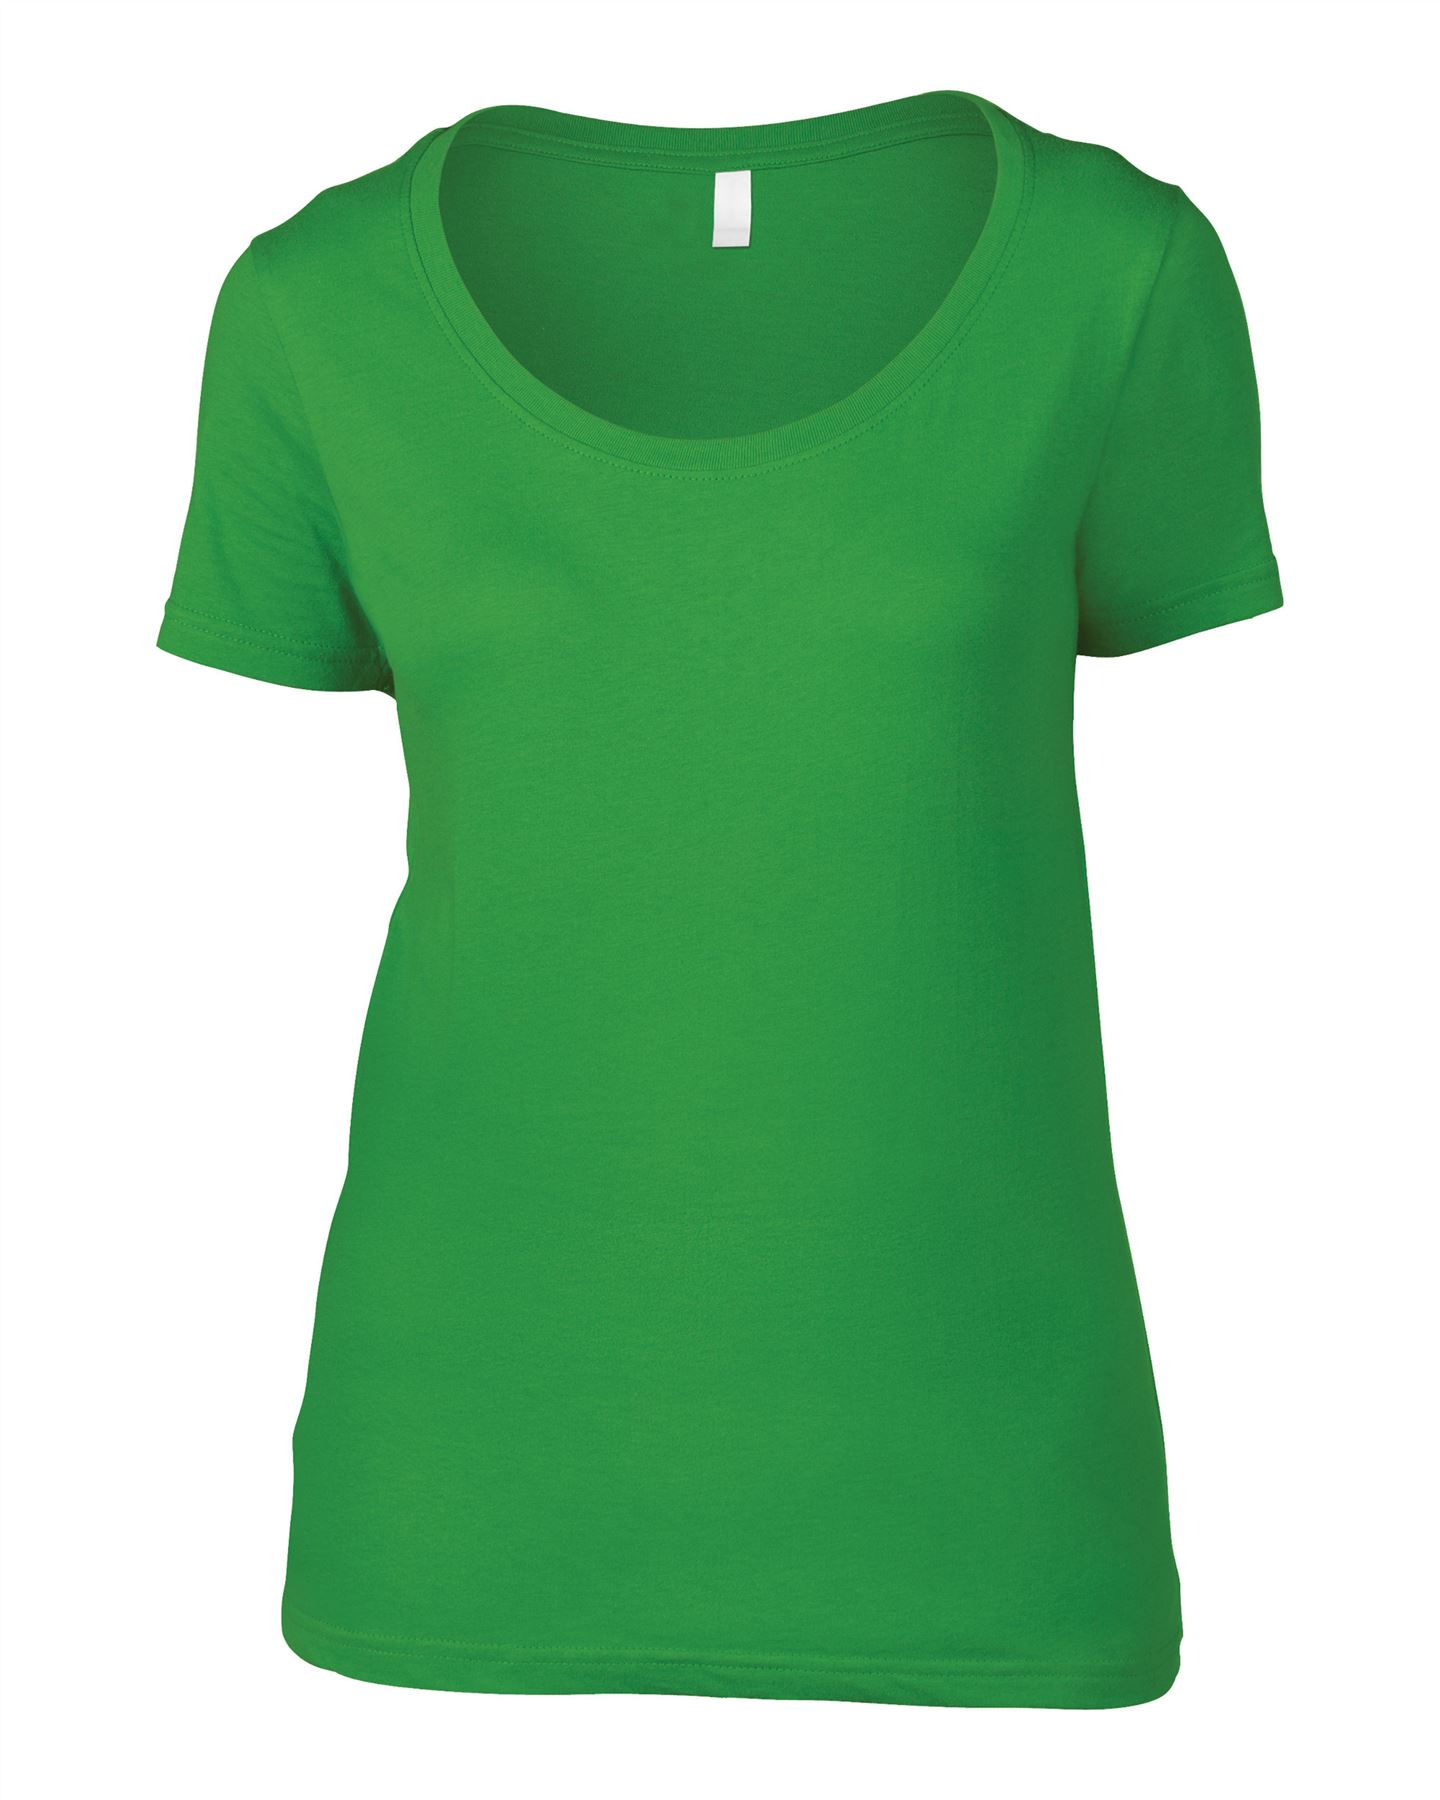 Anvil-Women-039-s-Trendy-featherweight-Scoop-Cotton-Tee-TShirt-T-Shirt-lot